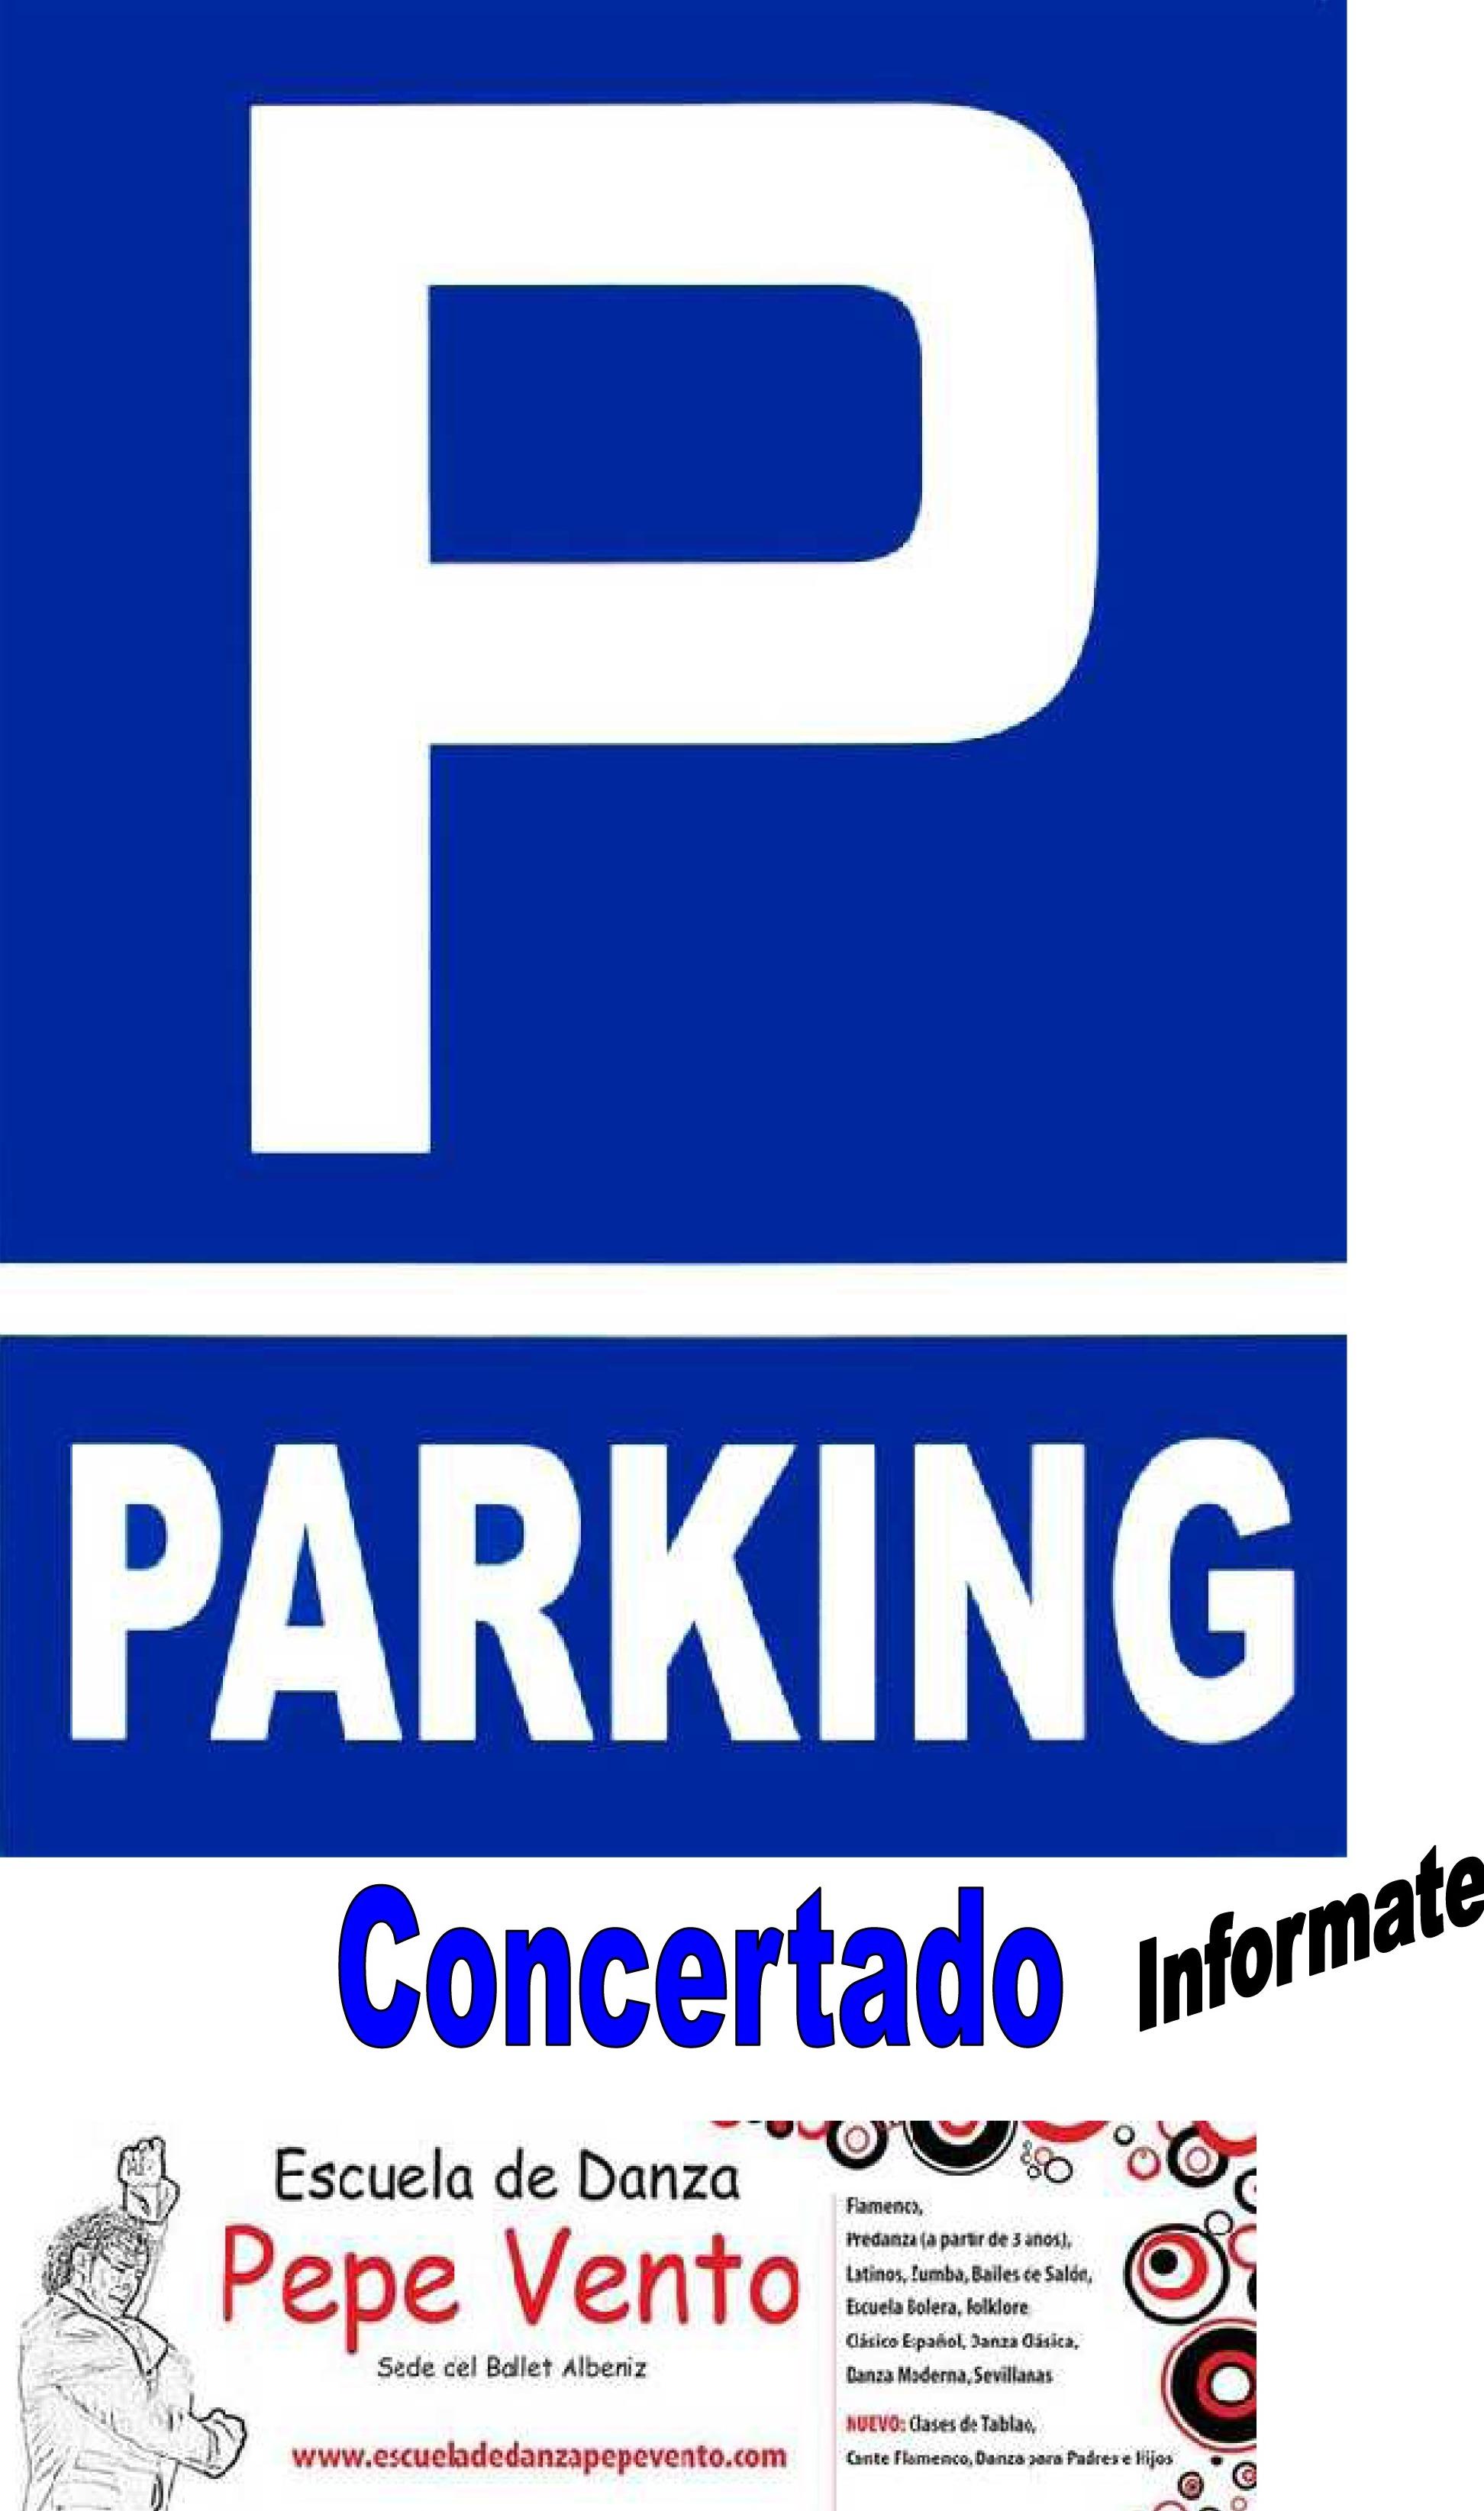 Parking Concertado